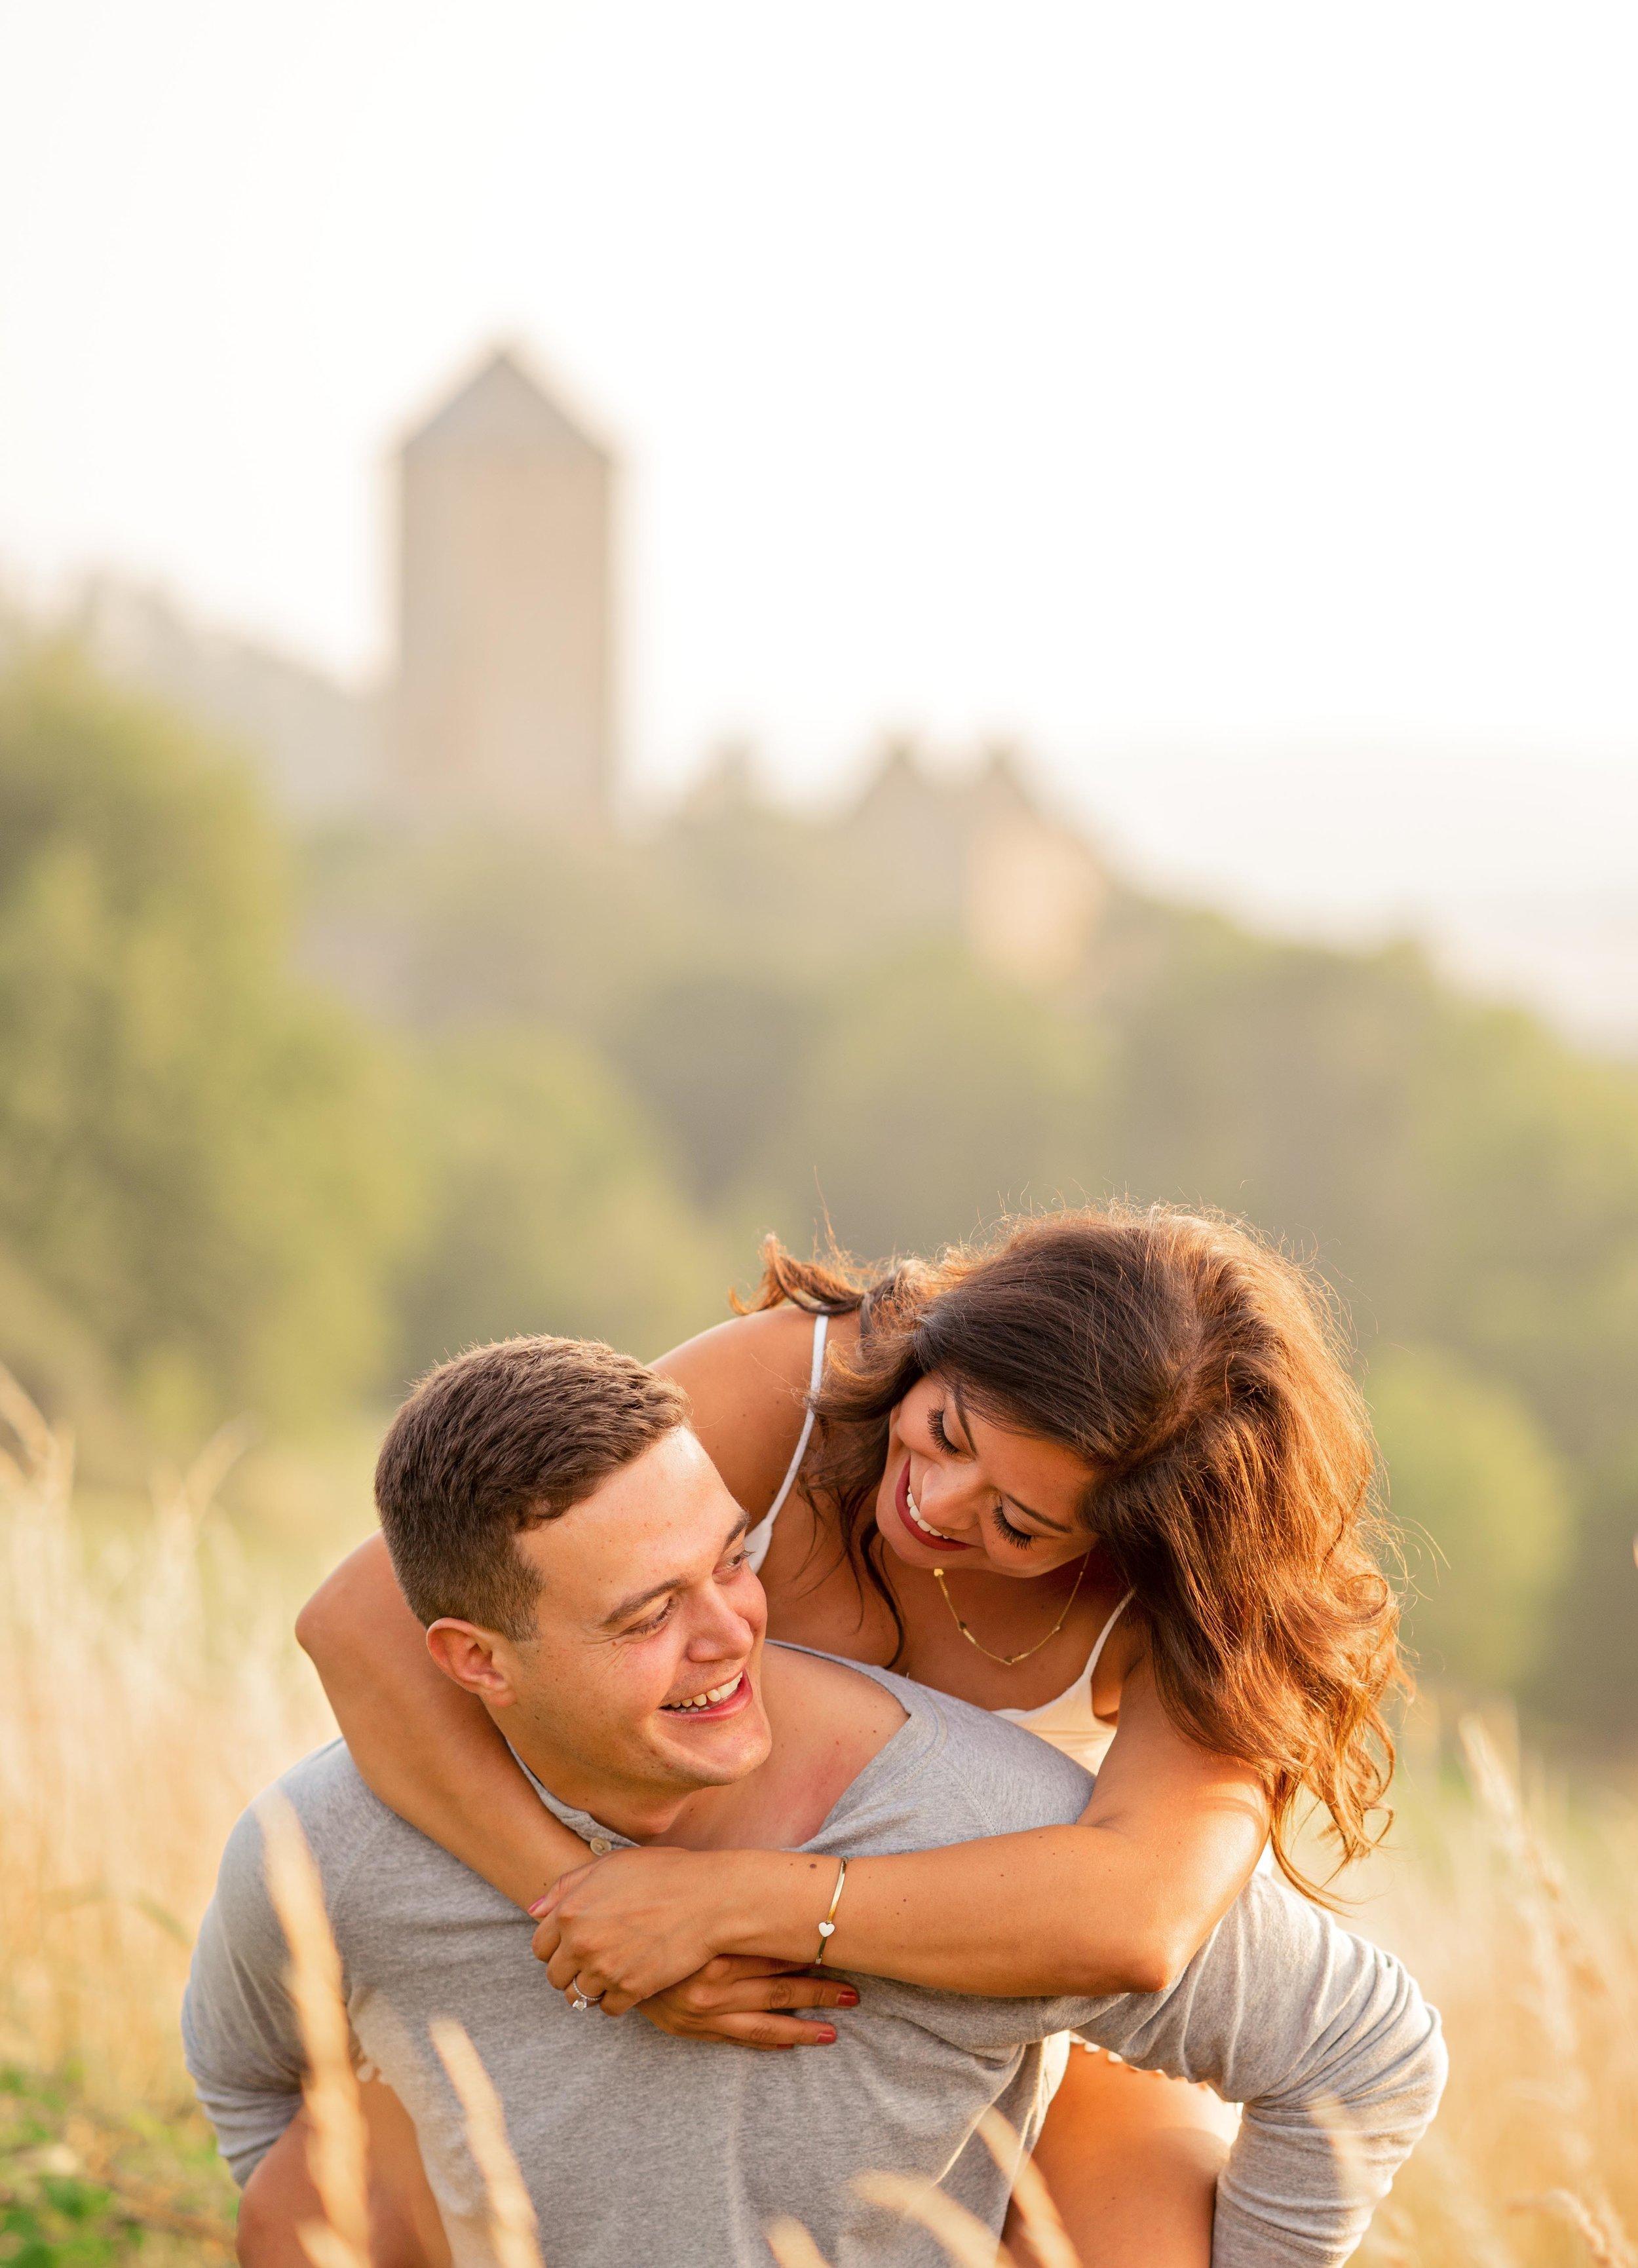 ramstein-kmc-couple-engagement-photographer-lichtenberg-castle-sarah-havens (9).jpg